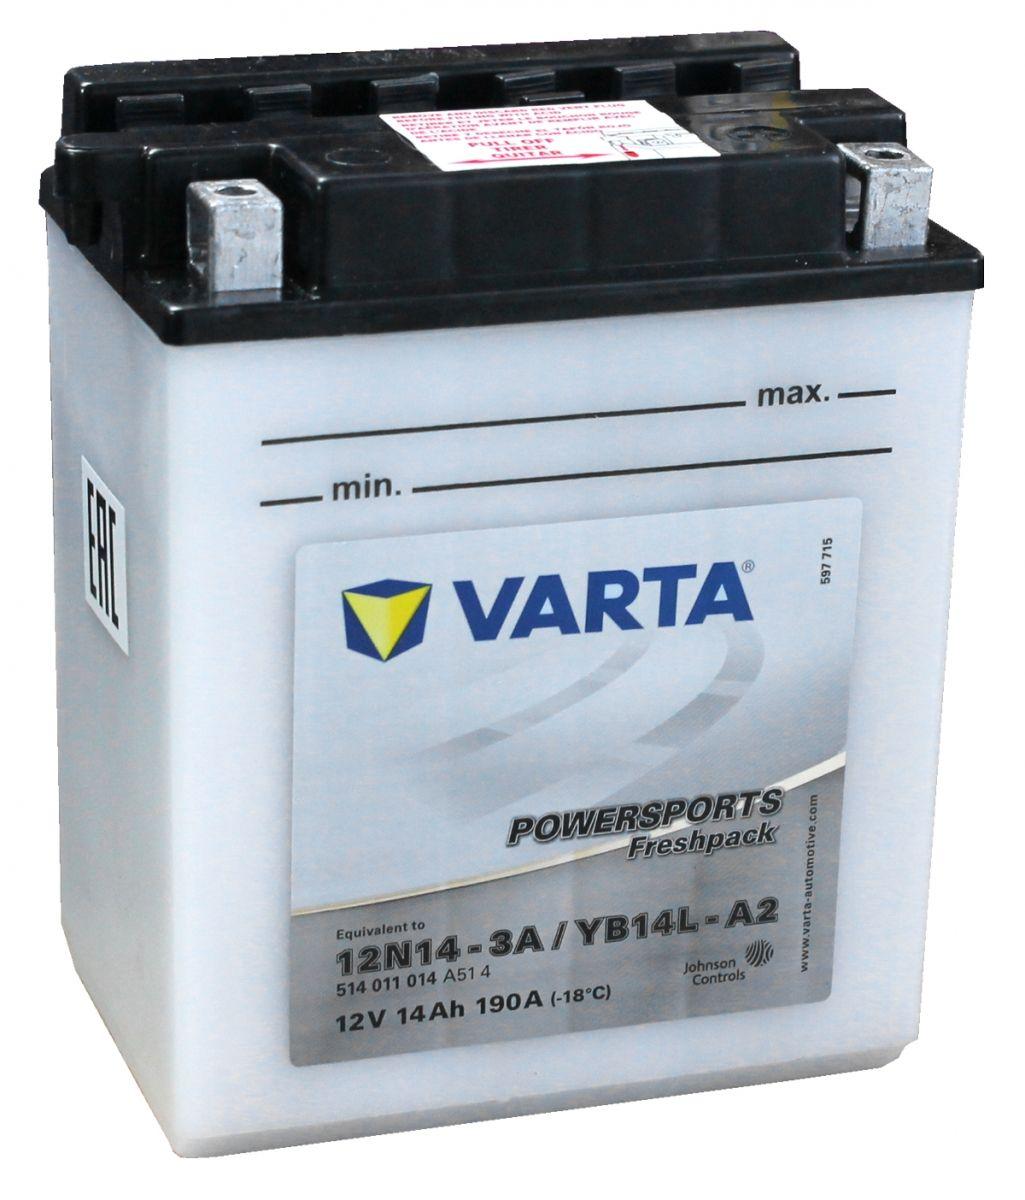 Yb14l A2 Varta Powersports Freshpack Motorcycle Battery 514 011 014 12n14 3a